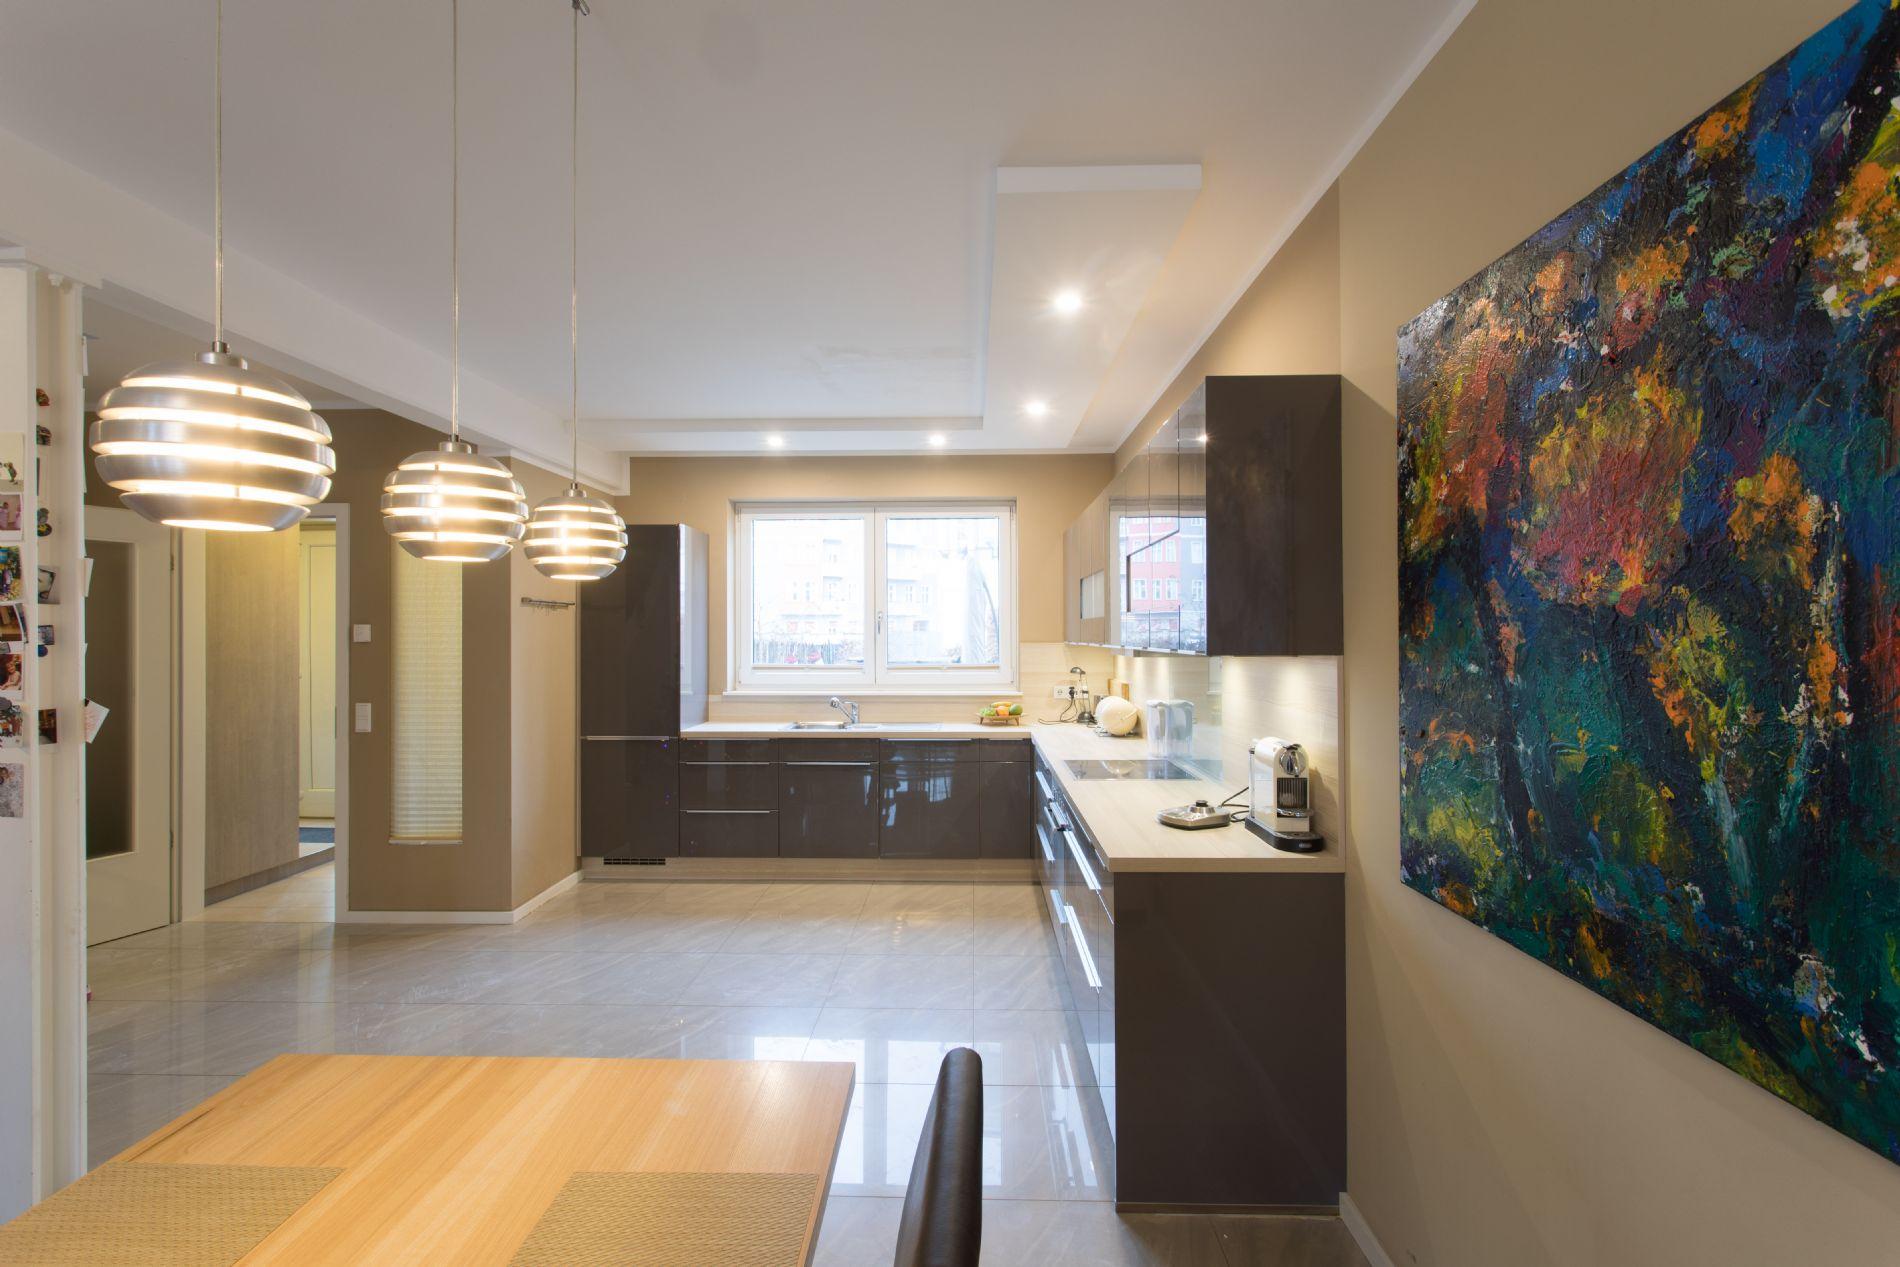 trockenbau kasten bauen gallery of trennwand aus holz with trockenbau kasten bauen trockenbau. Black Bedroom Furniture Sets. Home Design Ideas